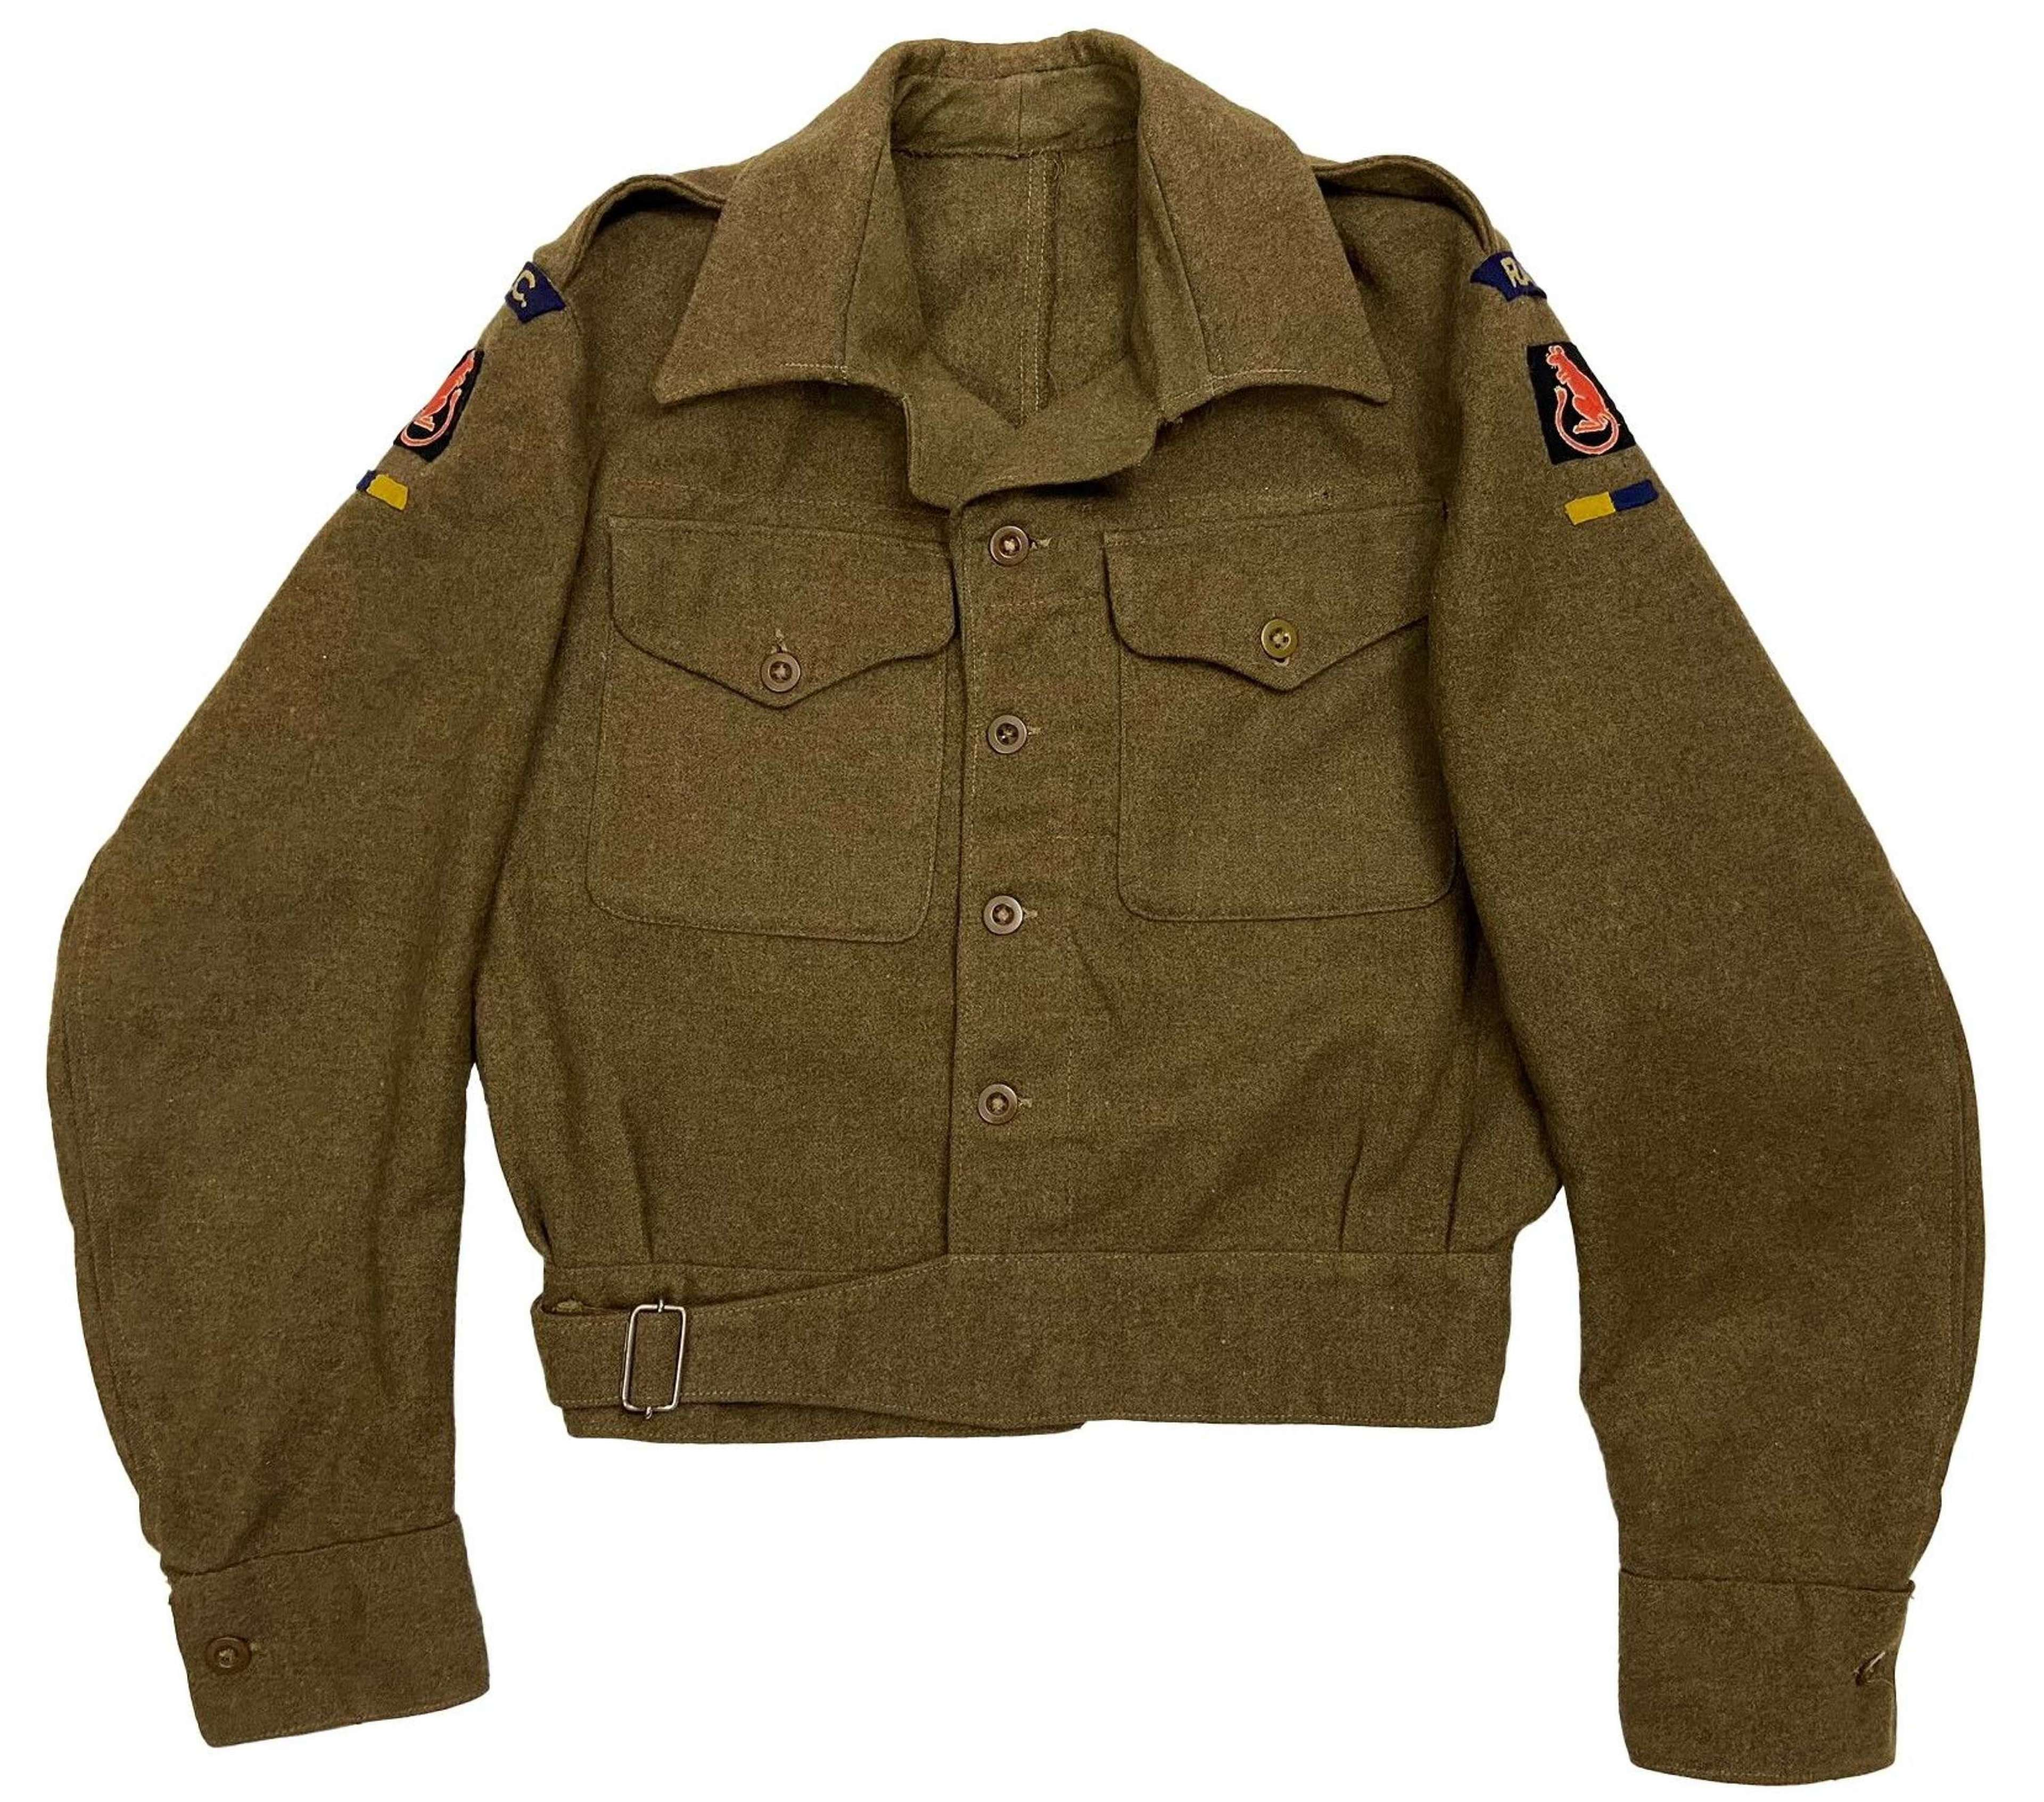 Original WW2 7th Armoured Division RASC Battledress Blouse